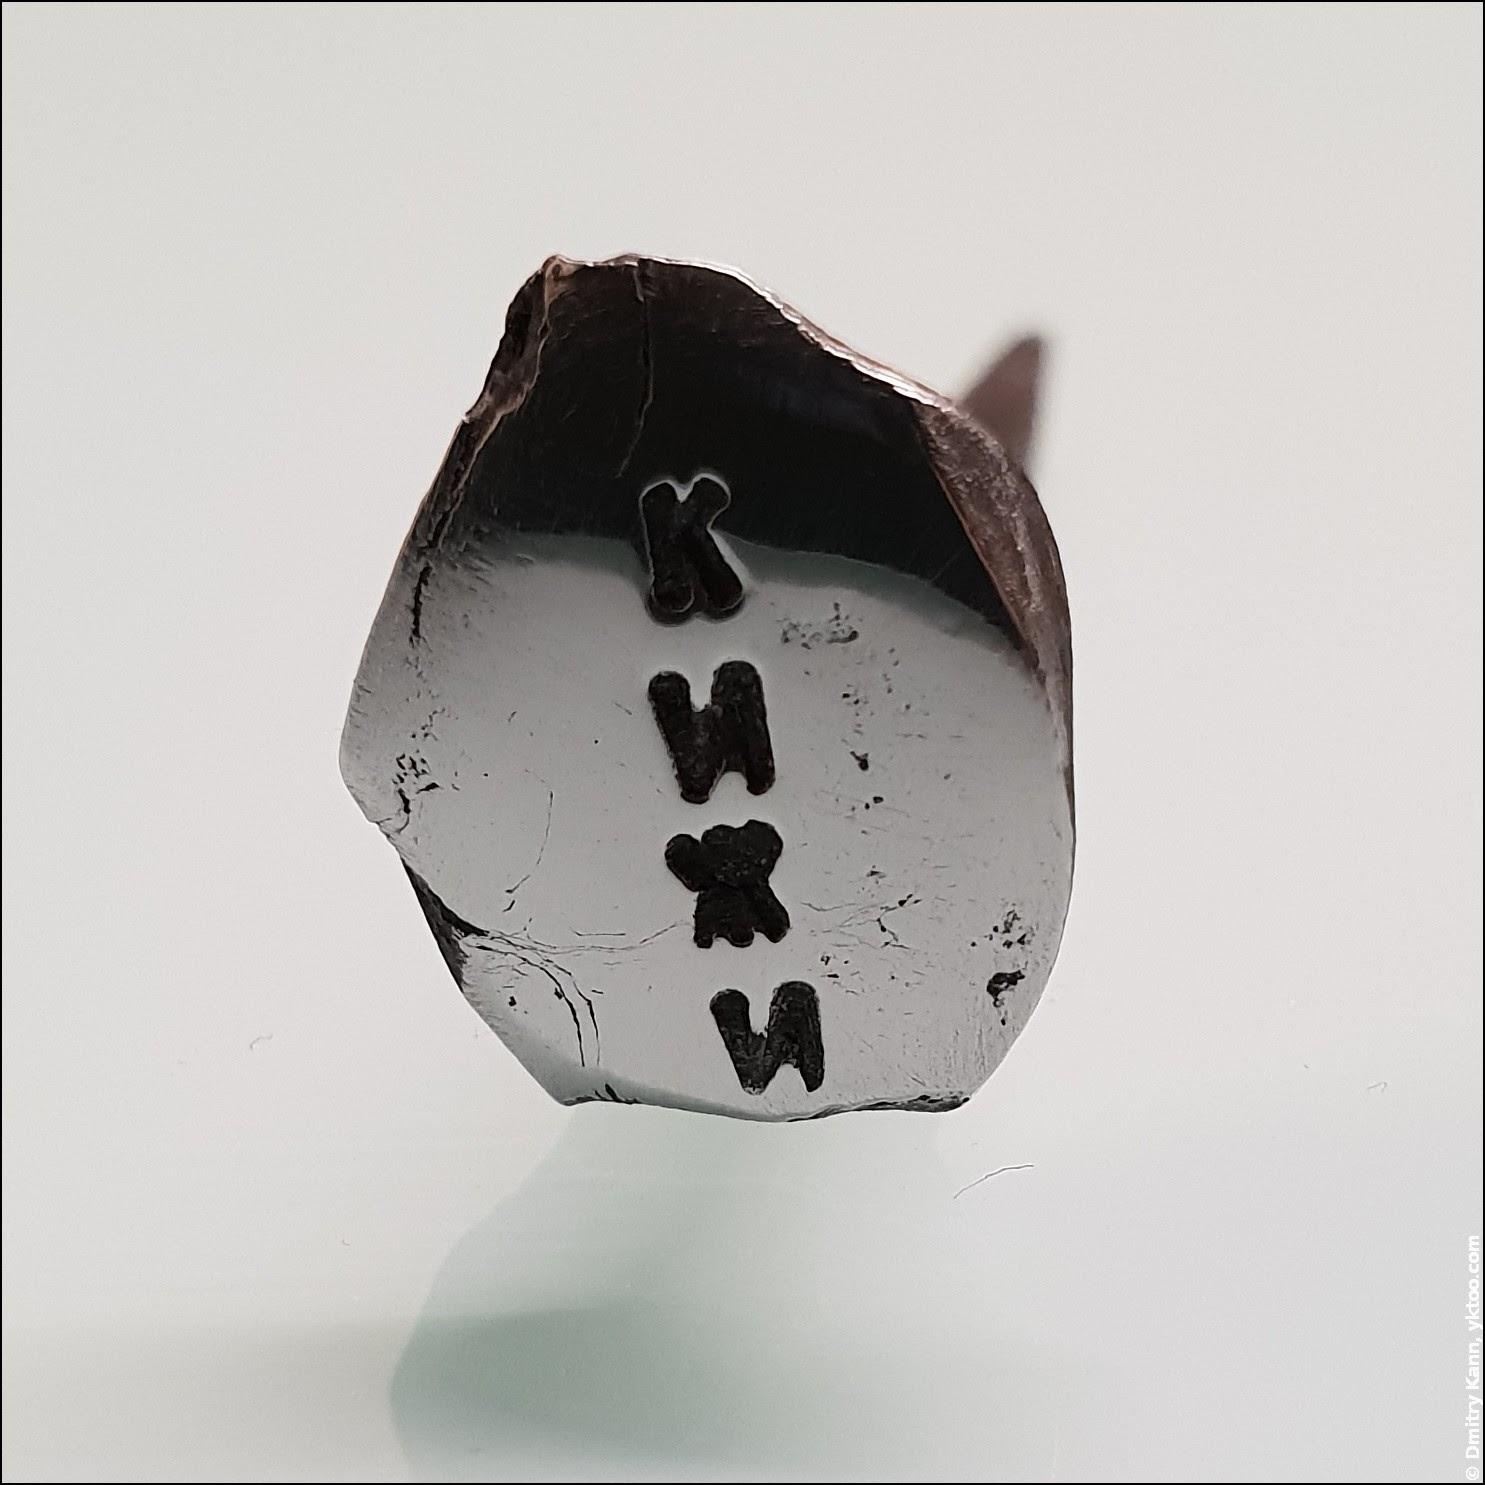 Nail from Kizhi.